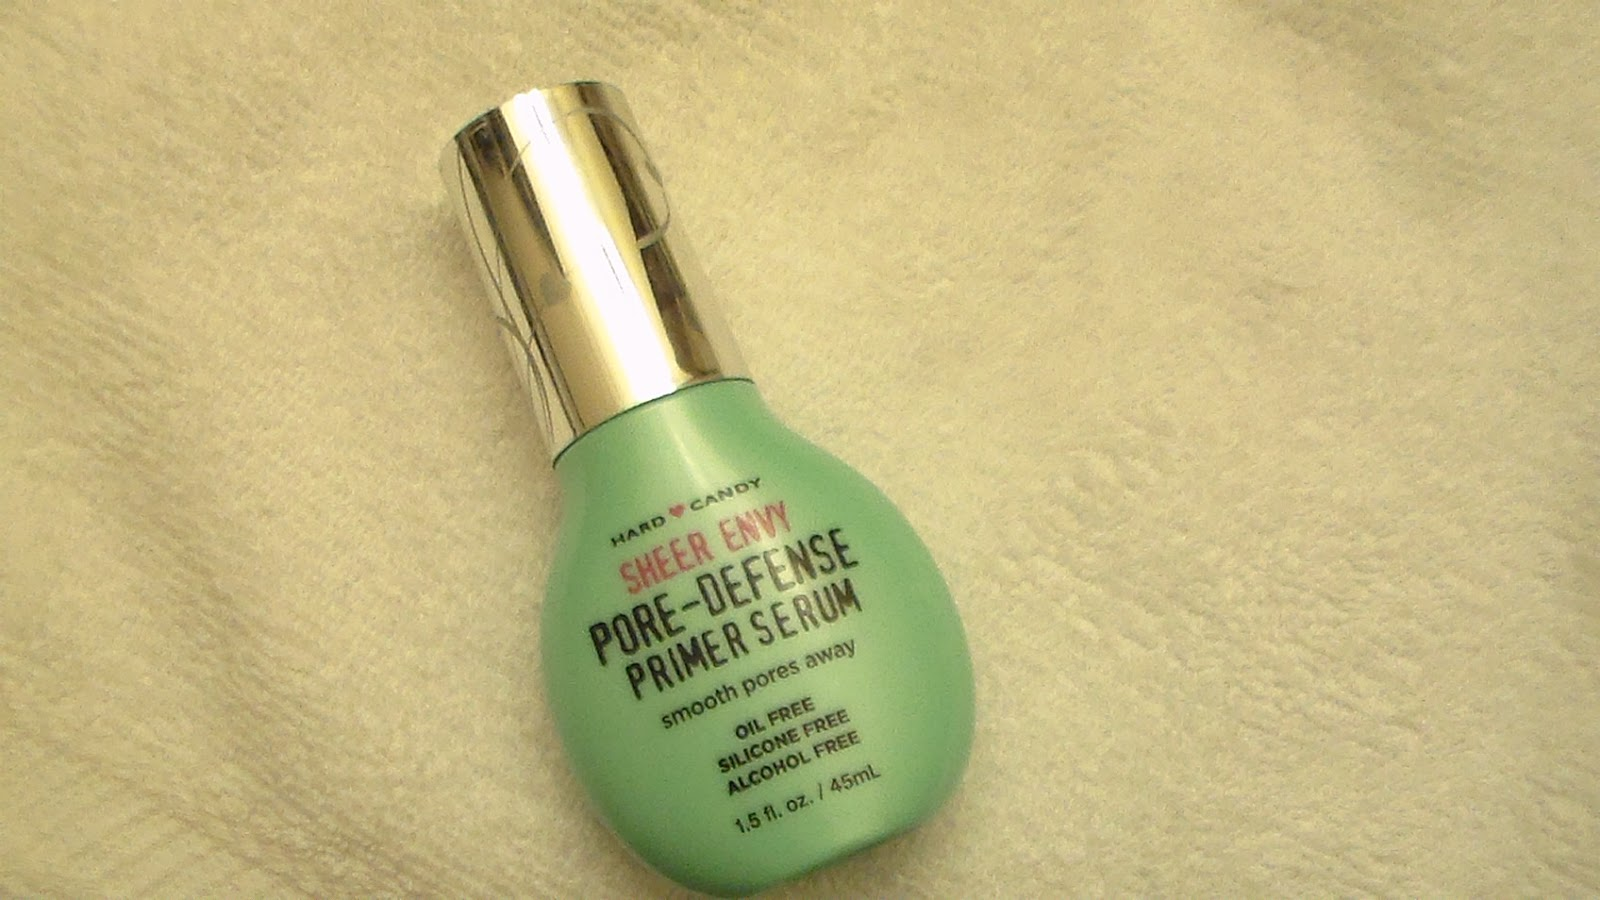 Makeup University Inc Hard Candy Sheer Envy Pore Defense Primer Serum